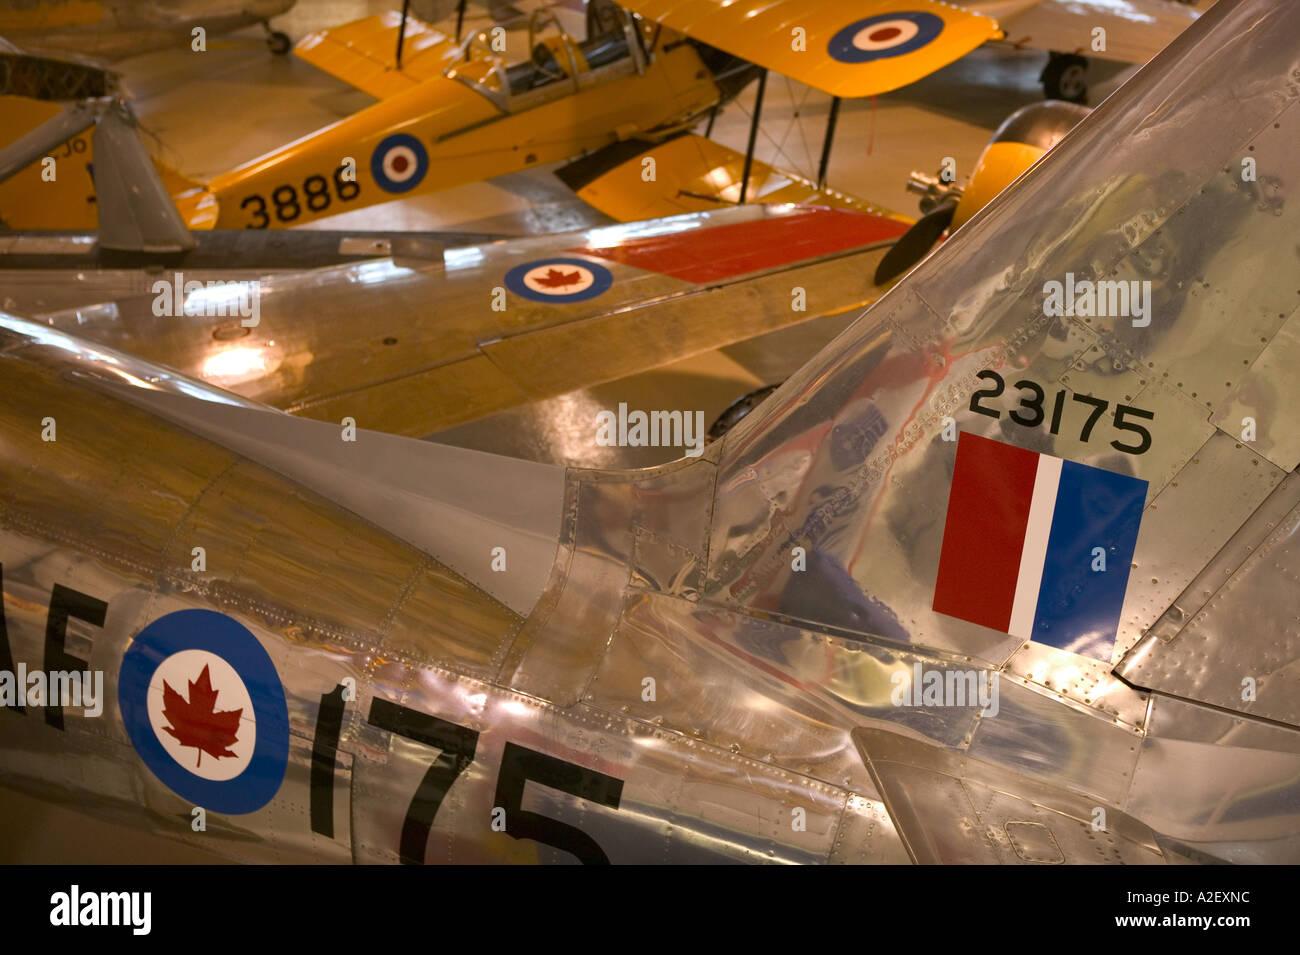 Canada, Alberta, Calgary: Aero Space Museum of Calgary, 1950's Sabre Jet - Stock Image